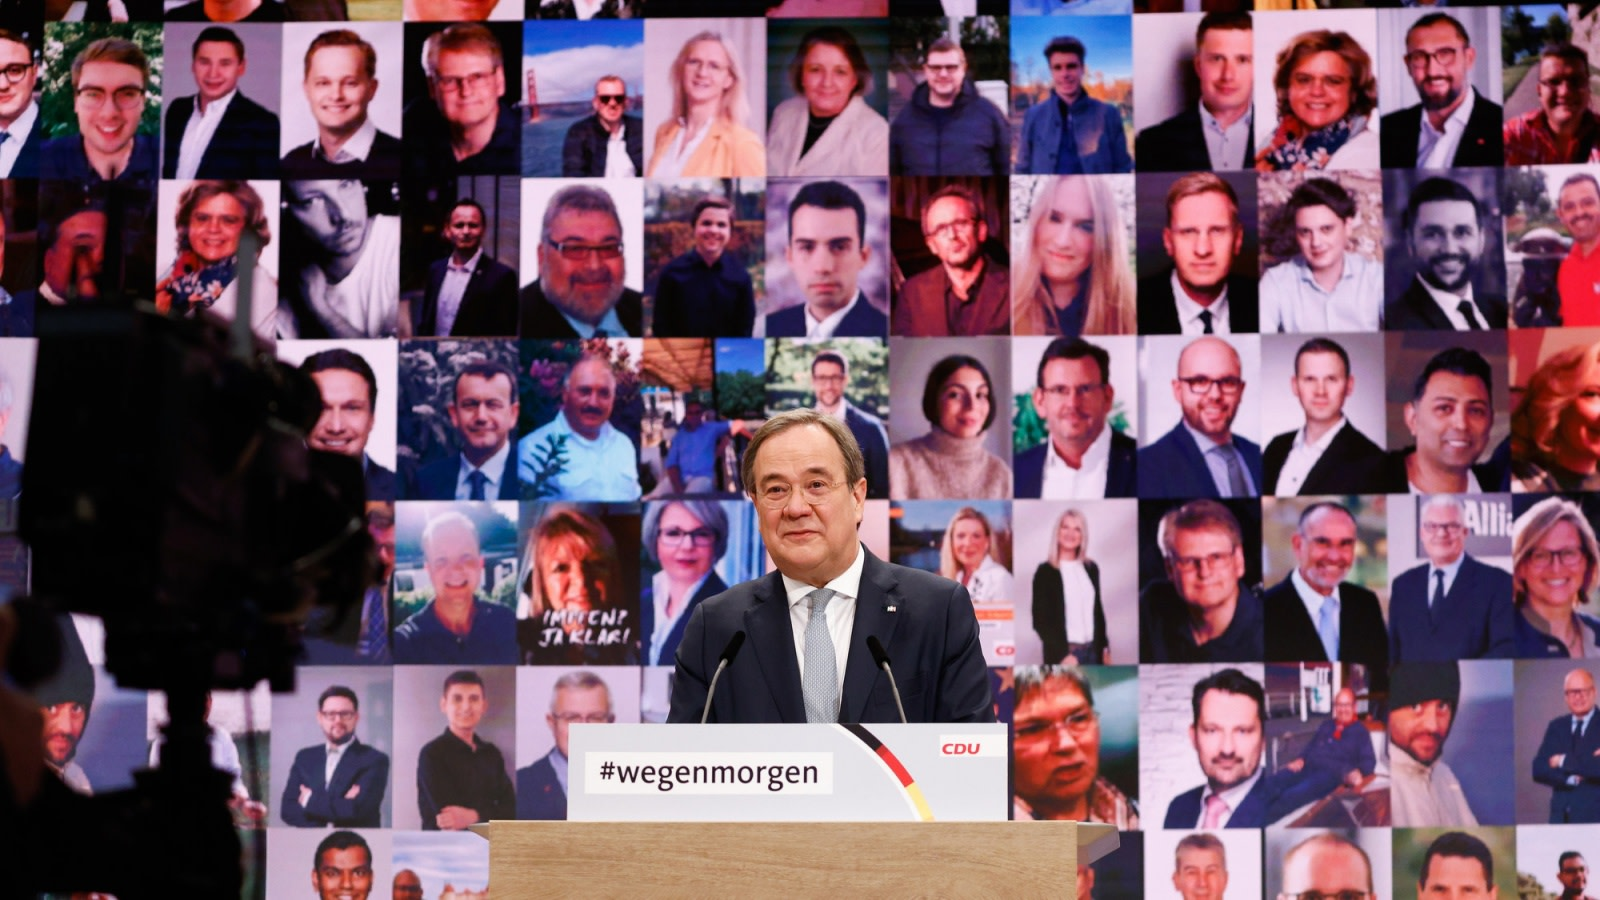 Foto: CDU / Tobias Koch